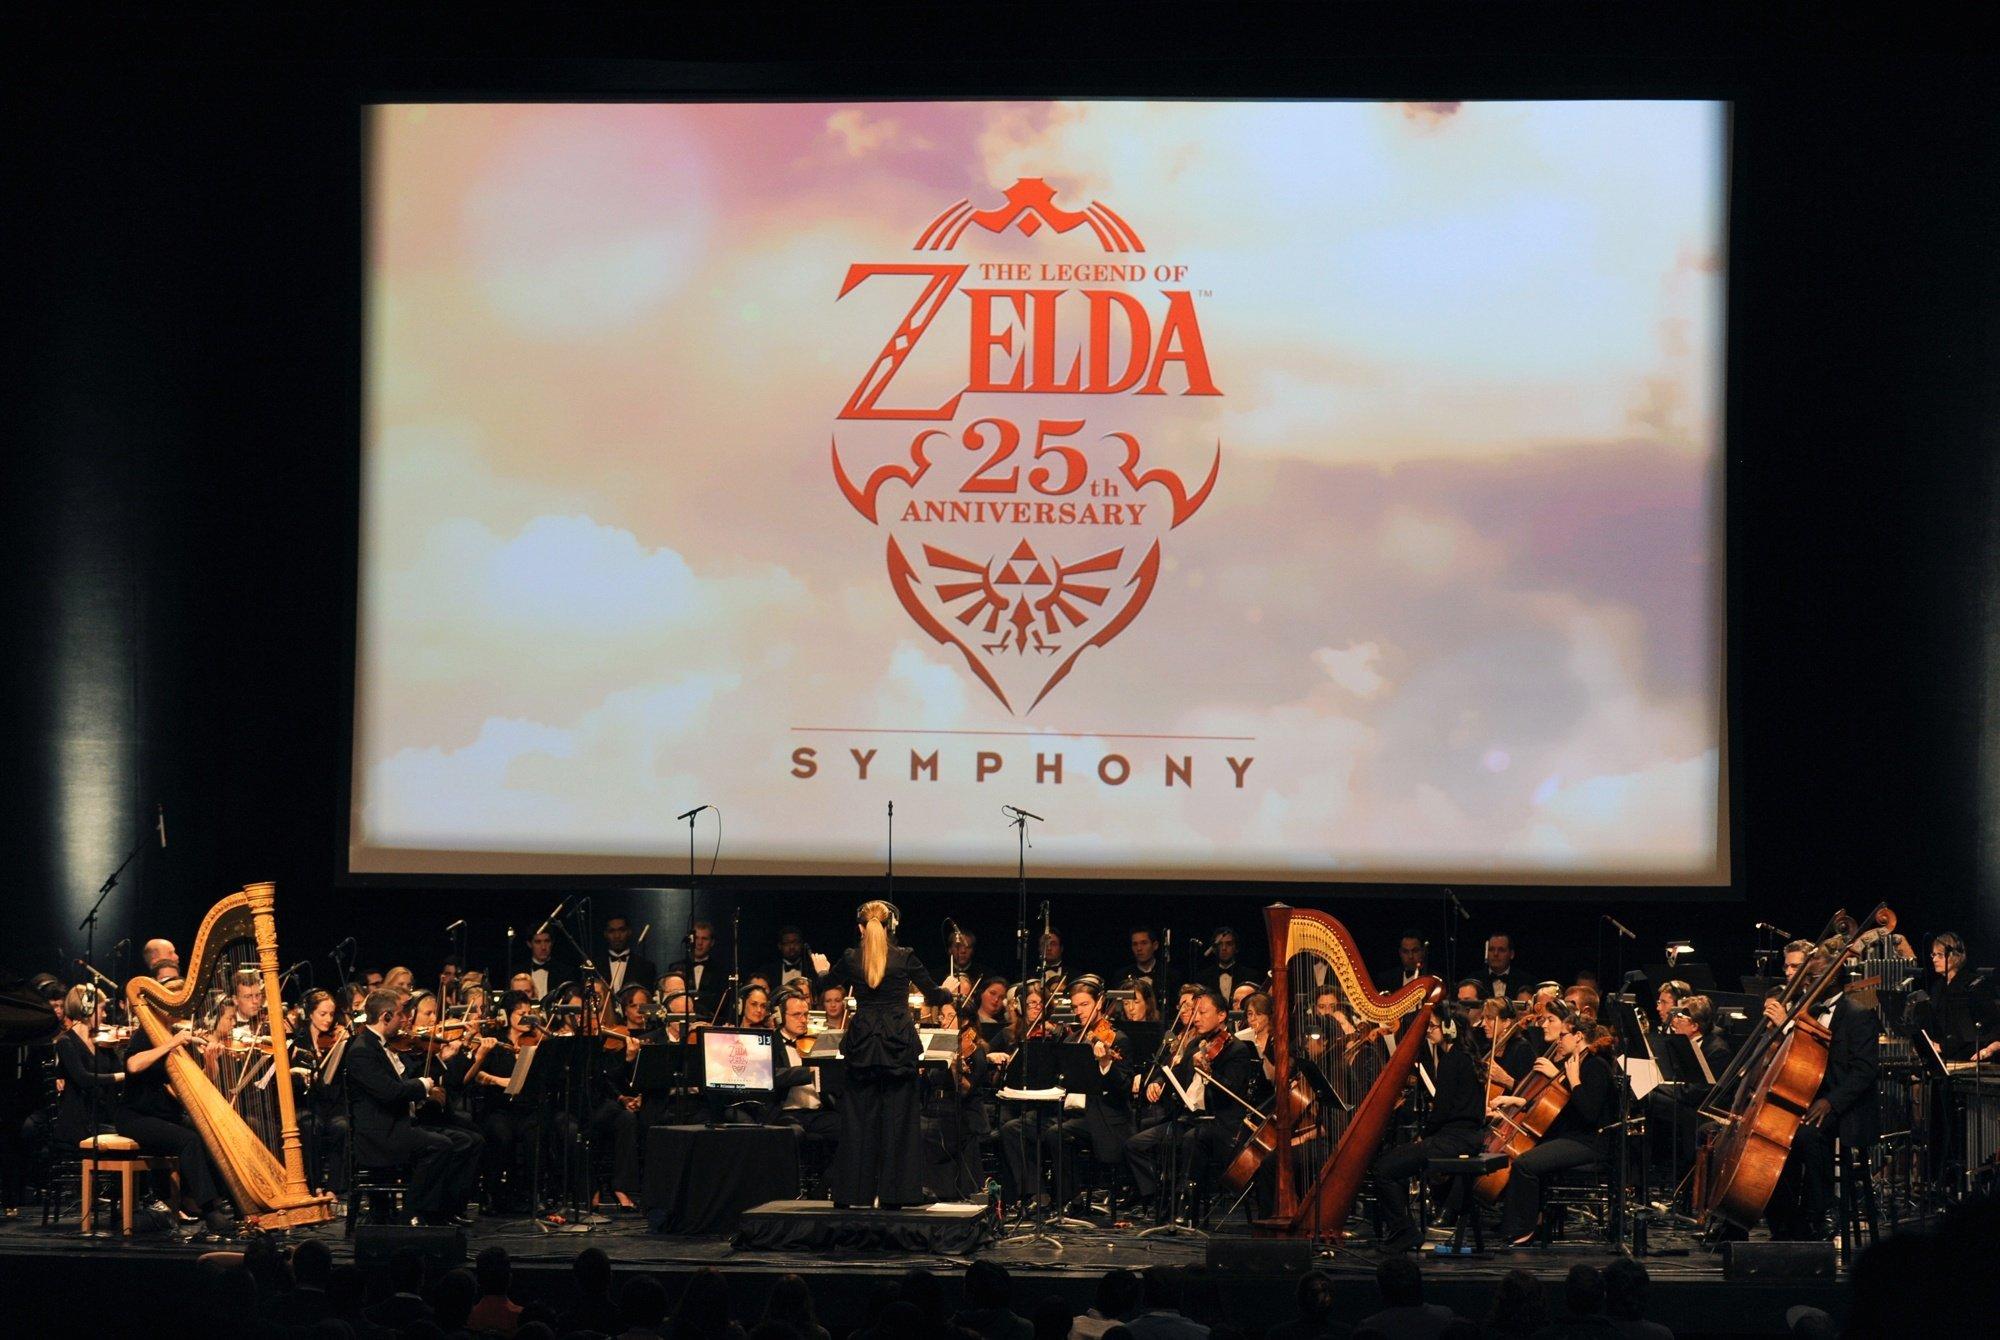 Nintendo Legend of Zelda 25th Anniversary Symphony